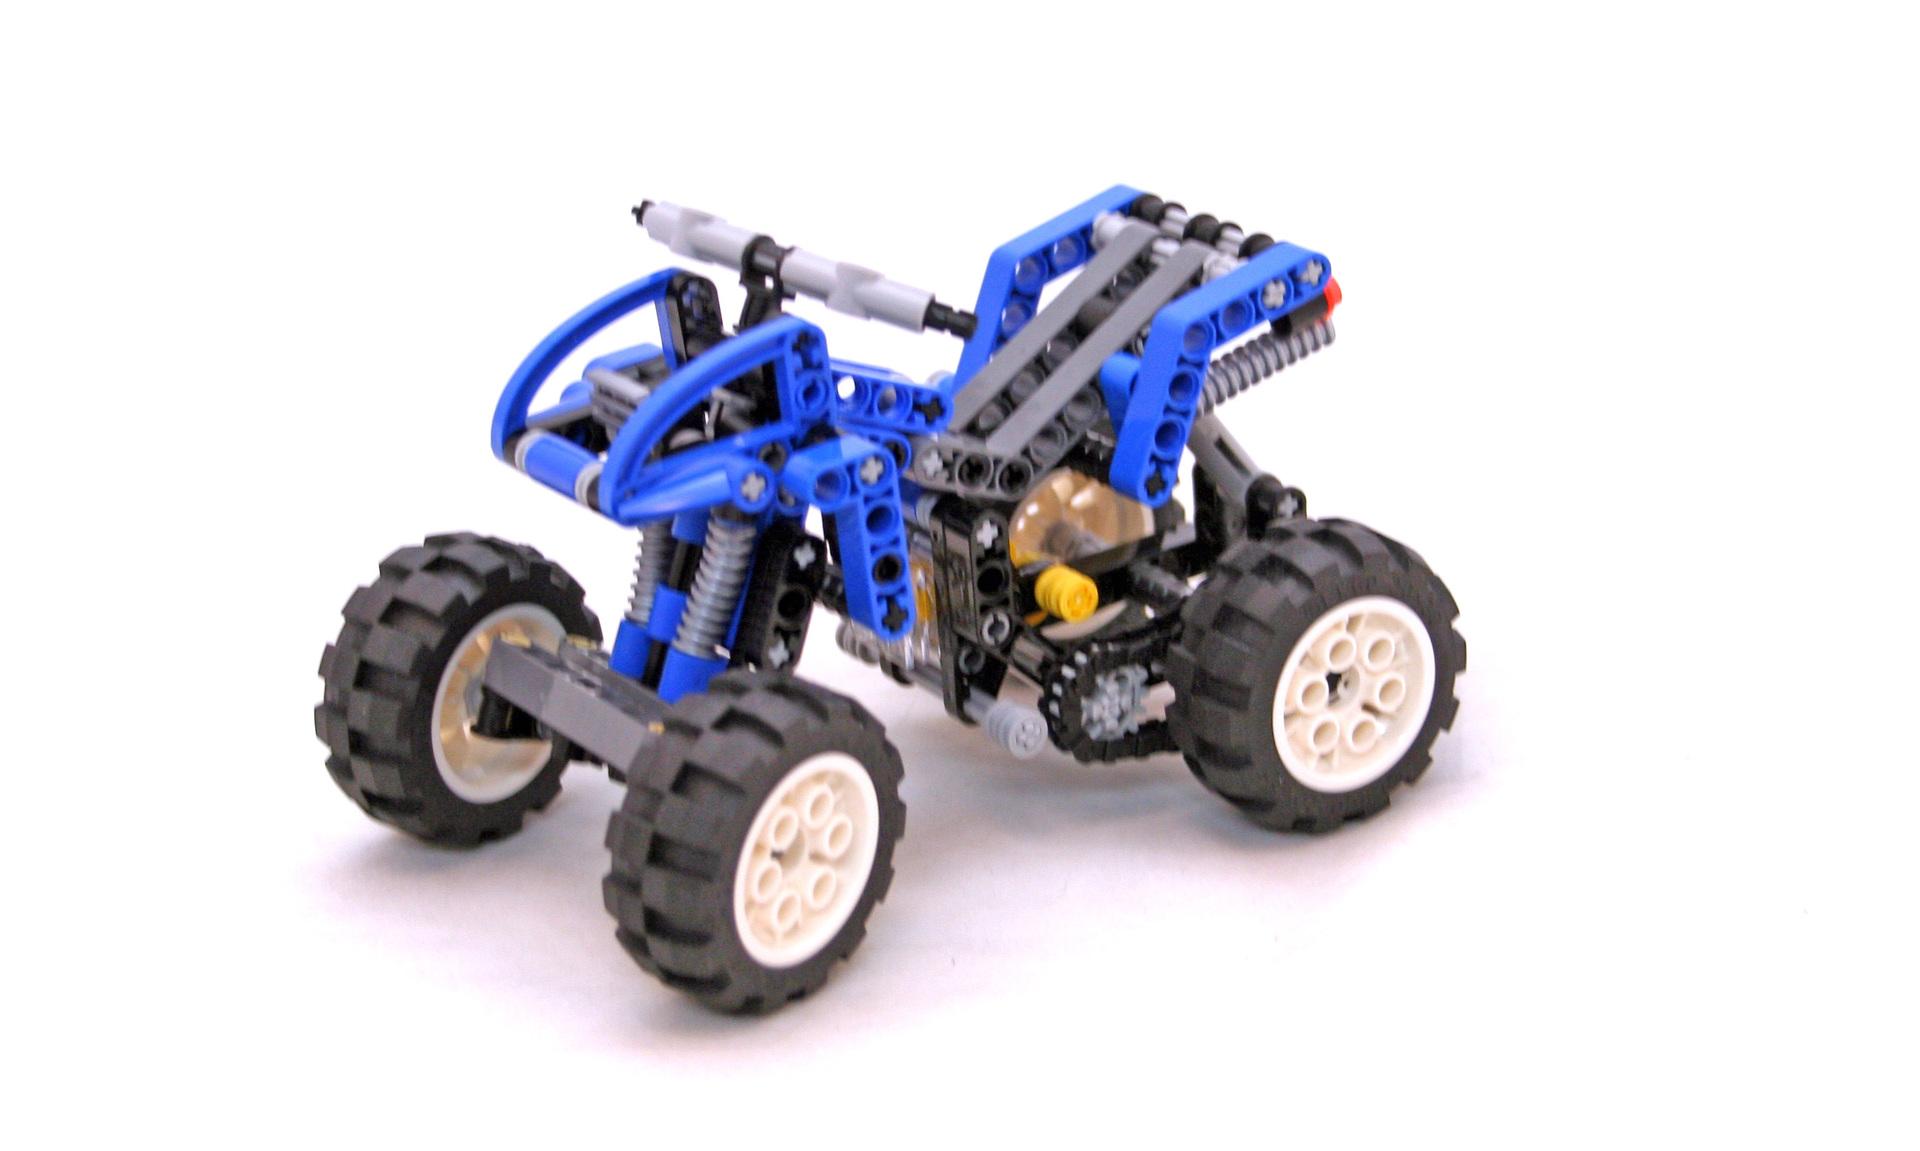 Quad Bike - LEGO set #8282-1 (Building Sets > Technic)